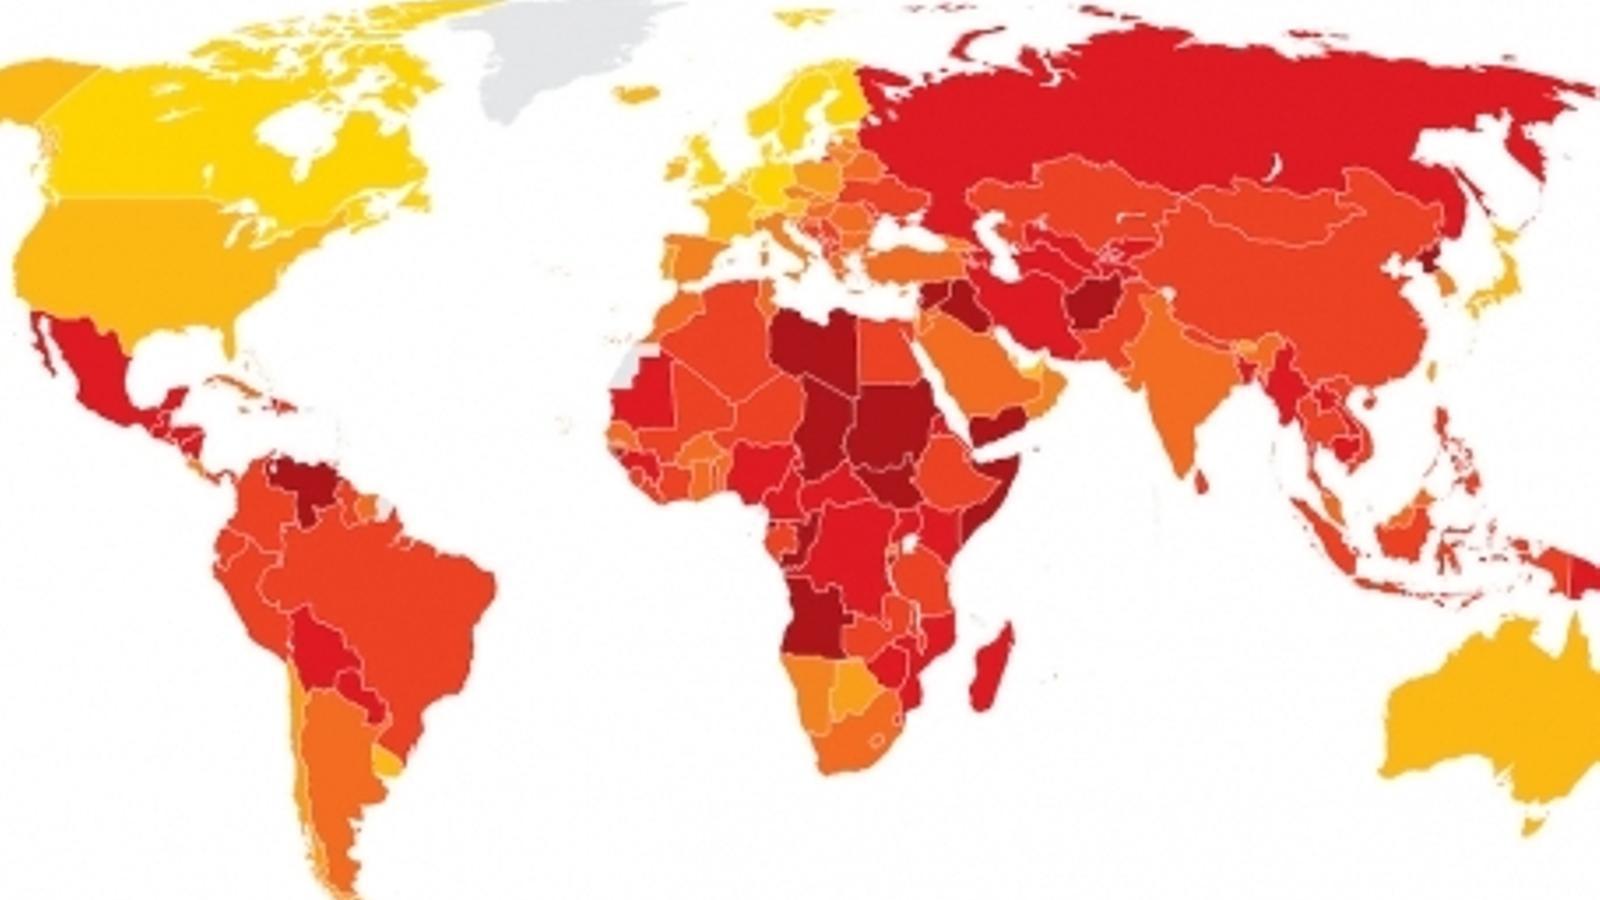 Index de Trasparència Internacional